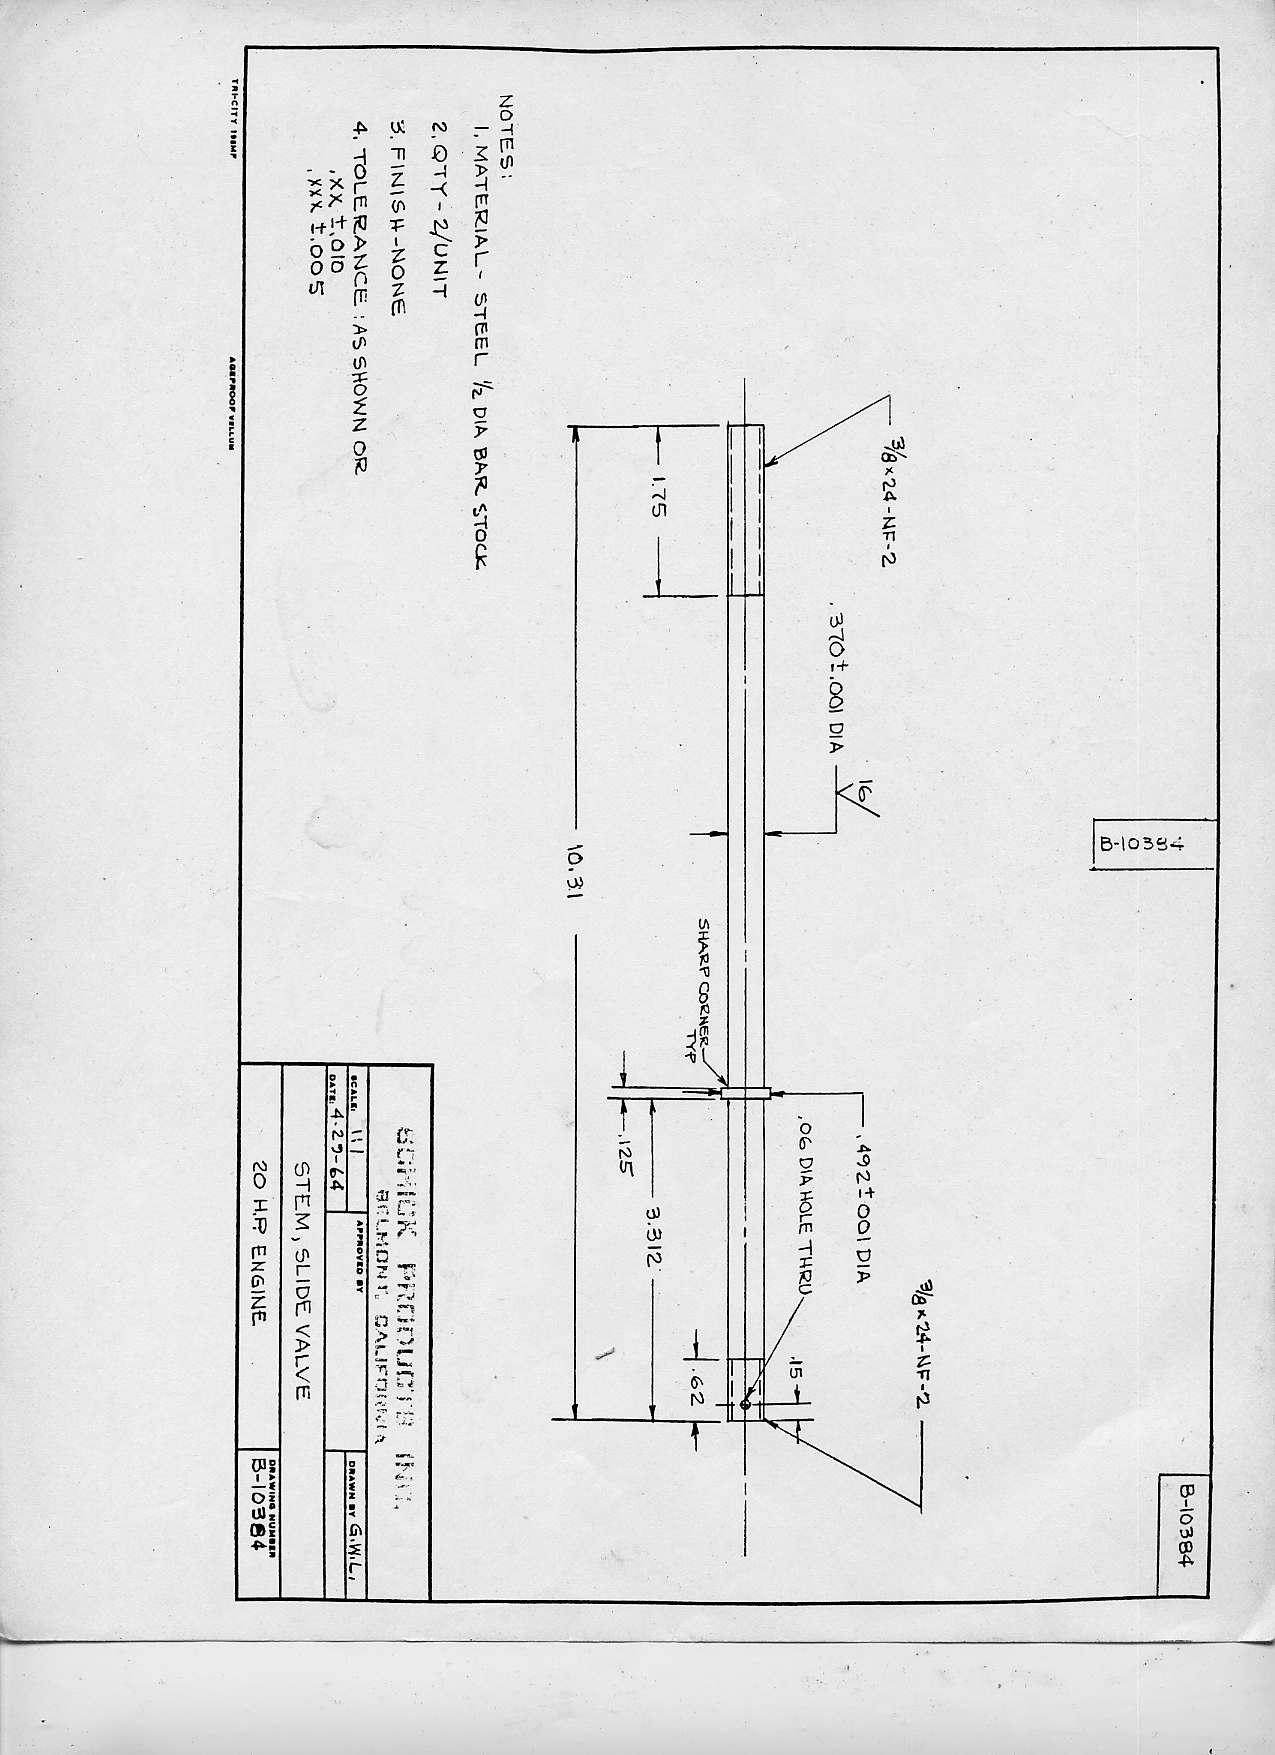 Simple Slide Valve Design For Model Steam Engine Valves Diagram Stanley740valvestem